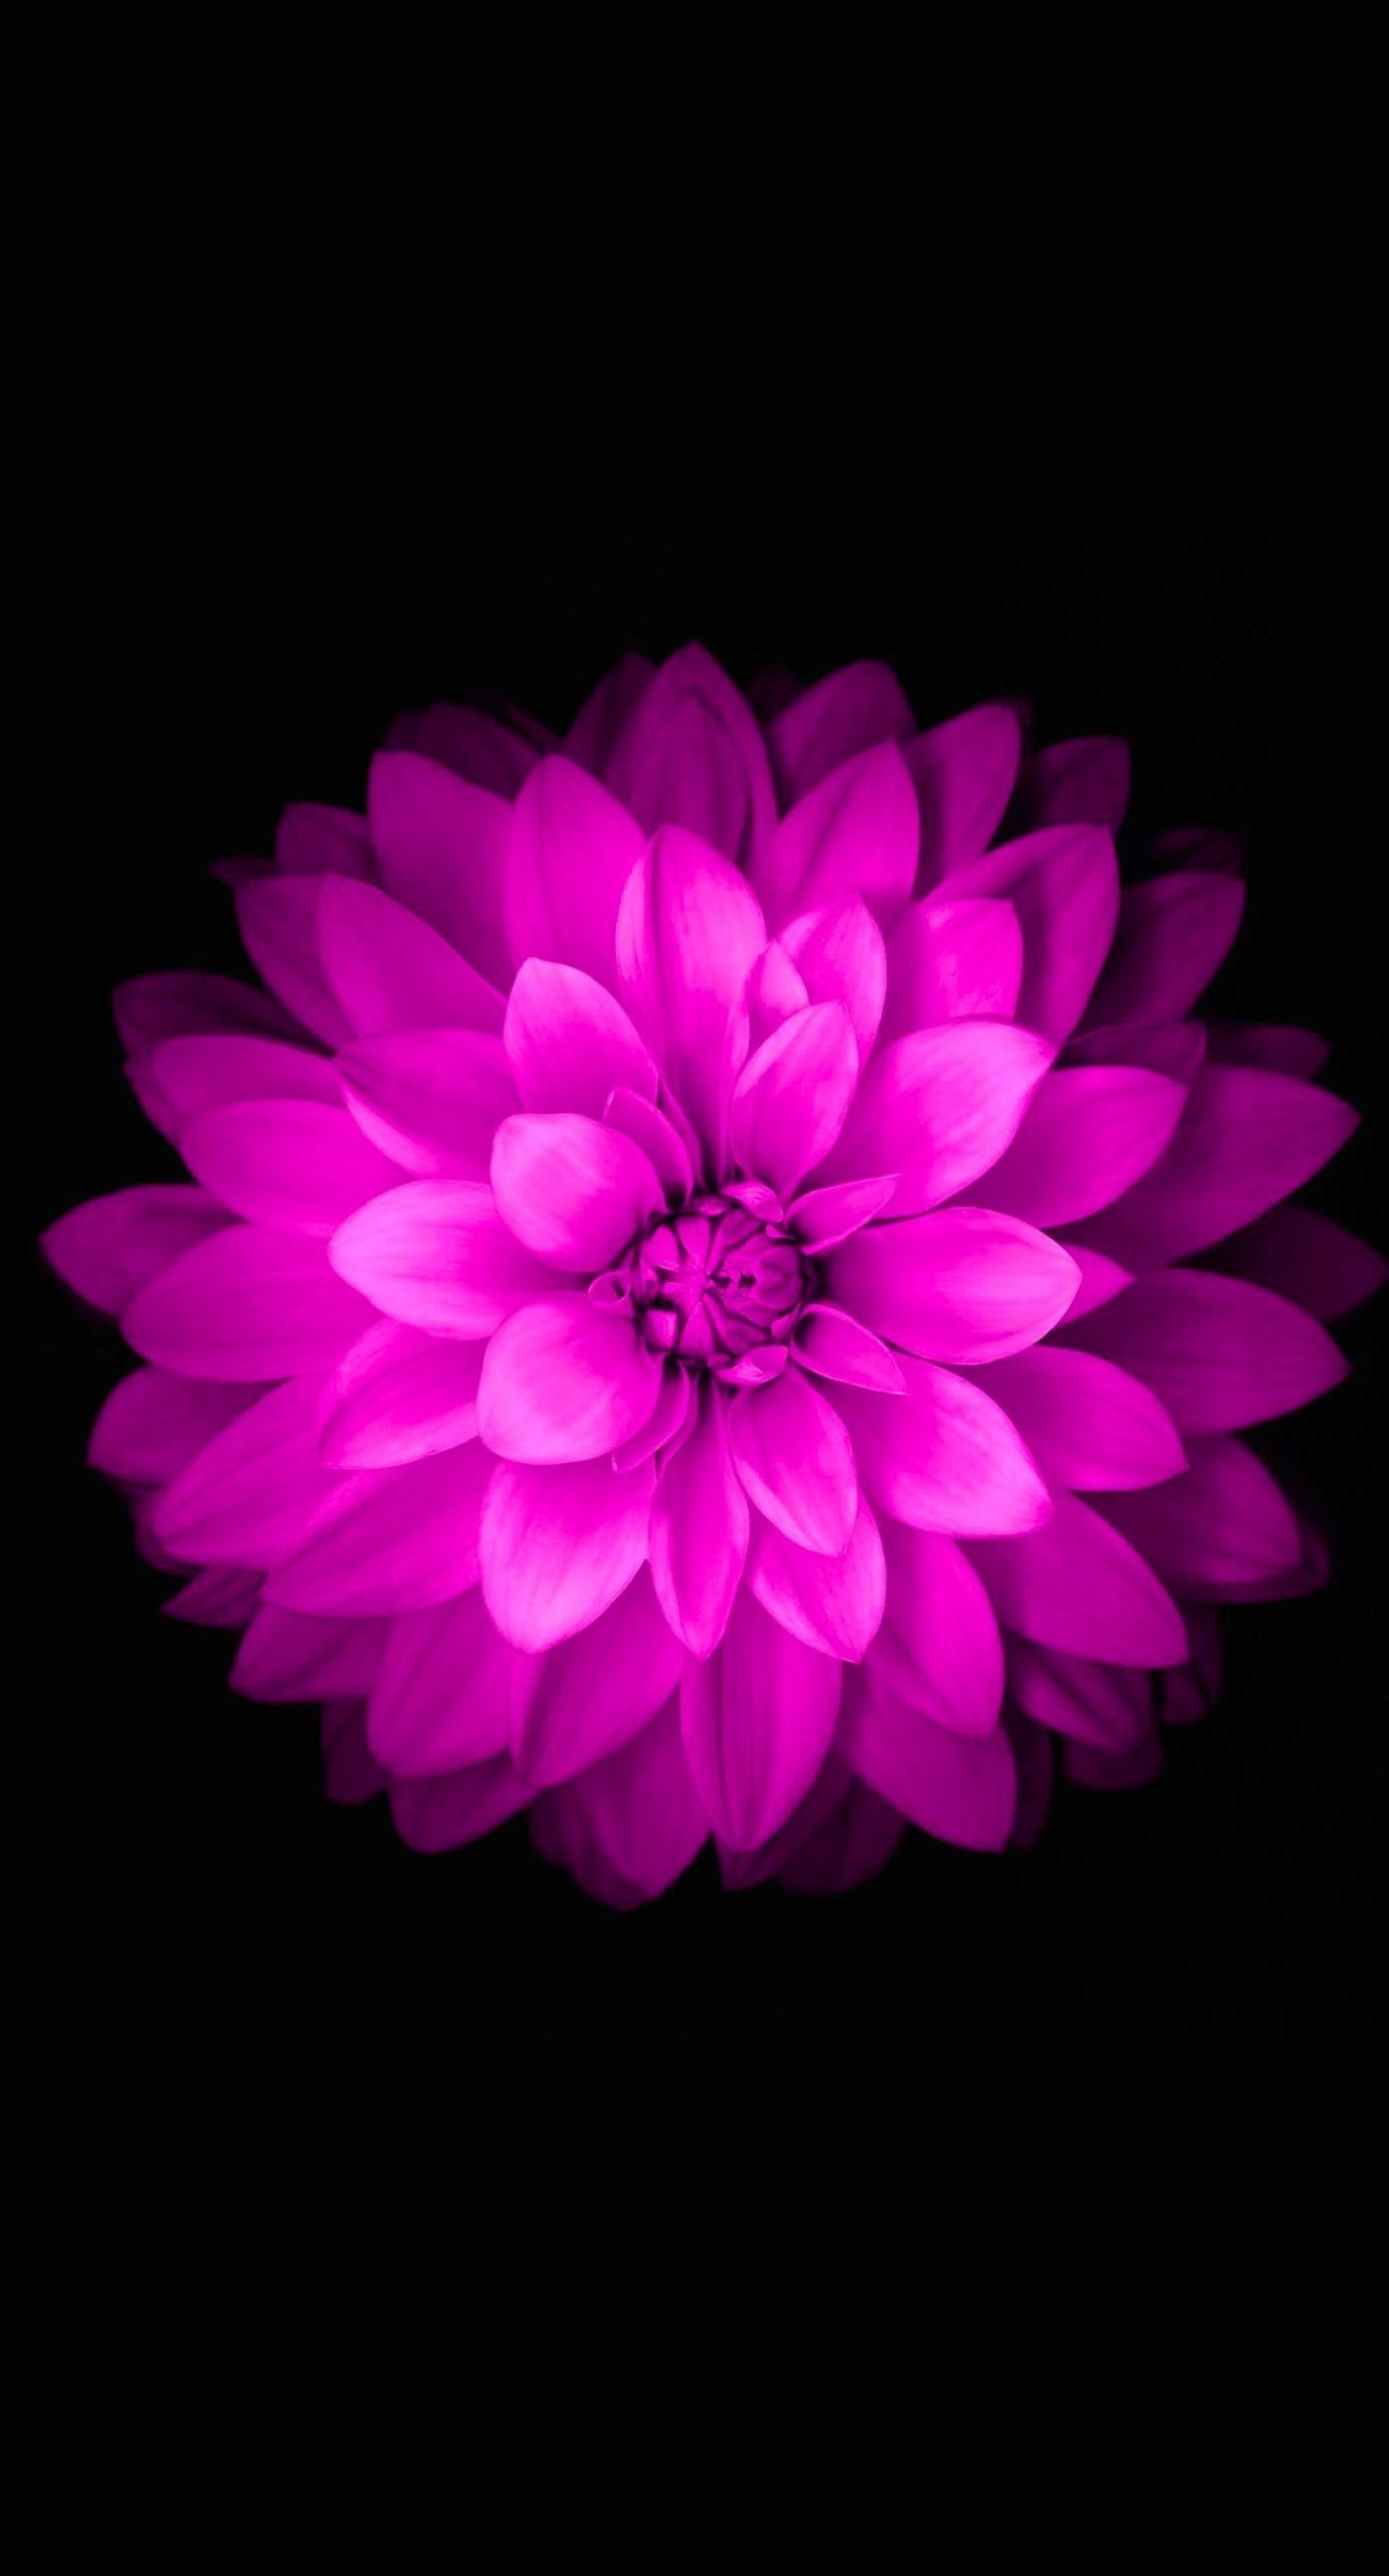 Purple Flower Iphone Wallpapers Top Free Purple Flower Iphone Backgrounds Wallpaperaccess